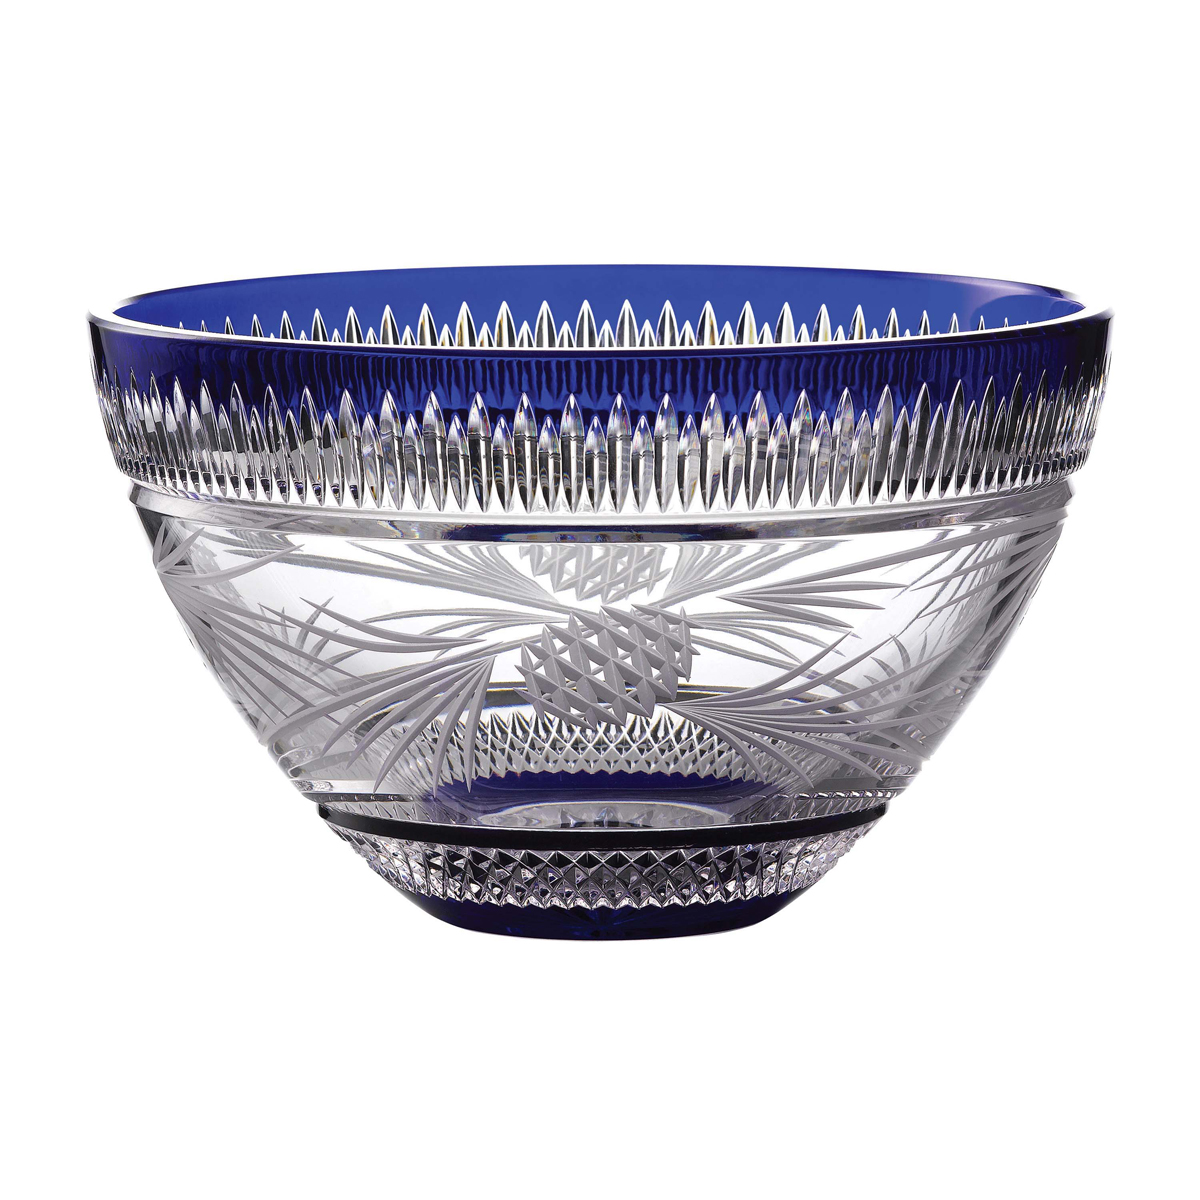 "Waterford 2020 Christmas Master Craft 11"" Bowl Cobalt"